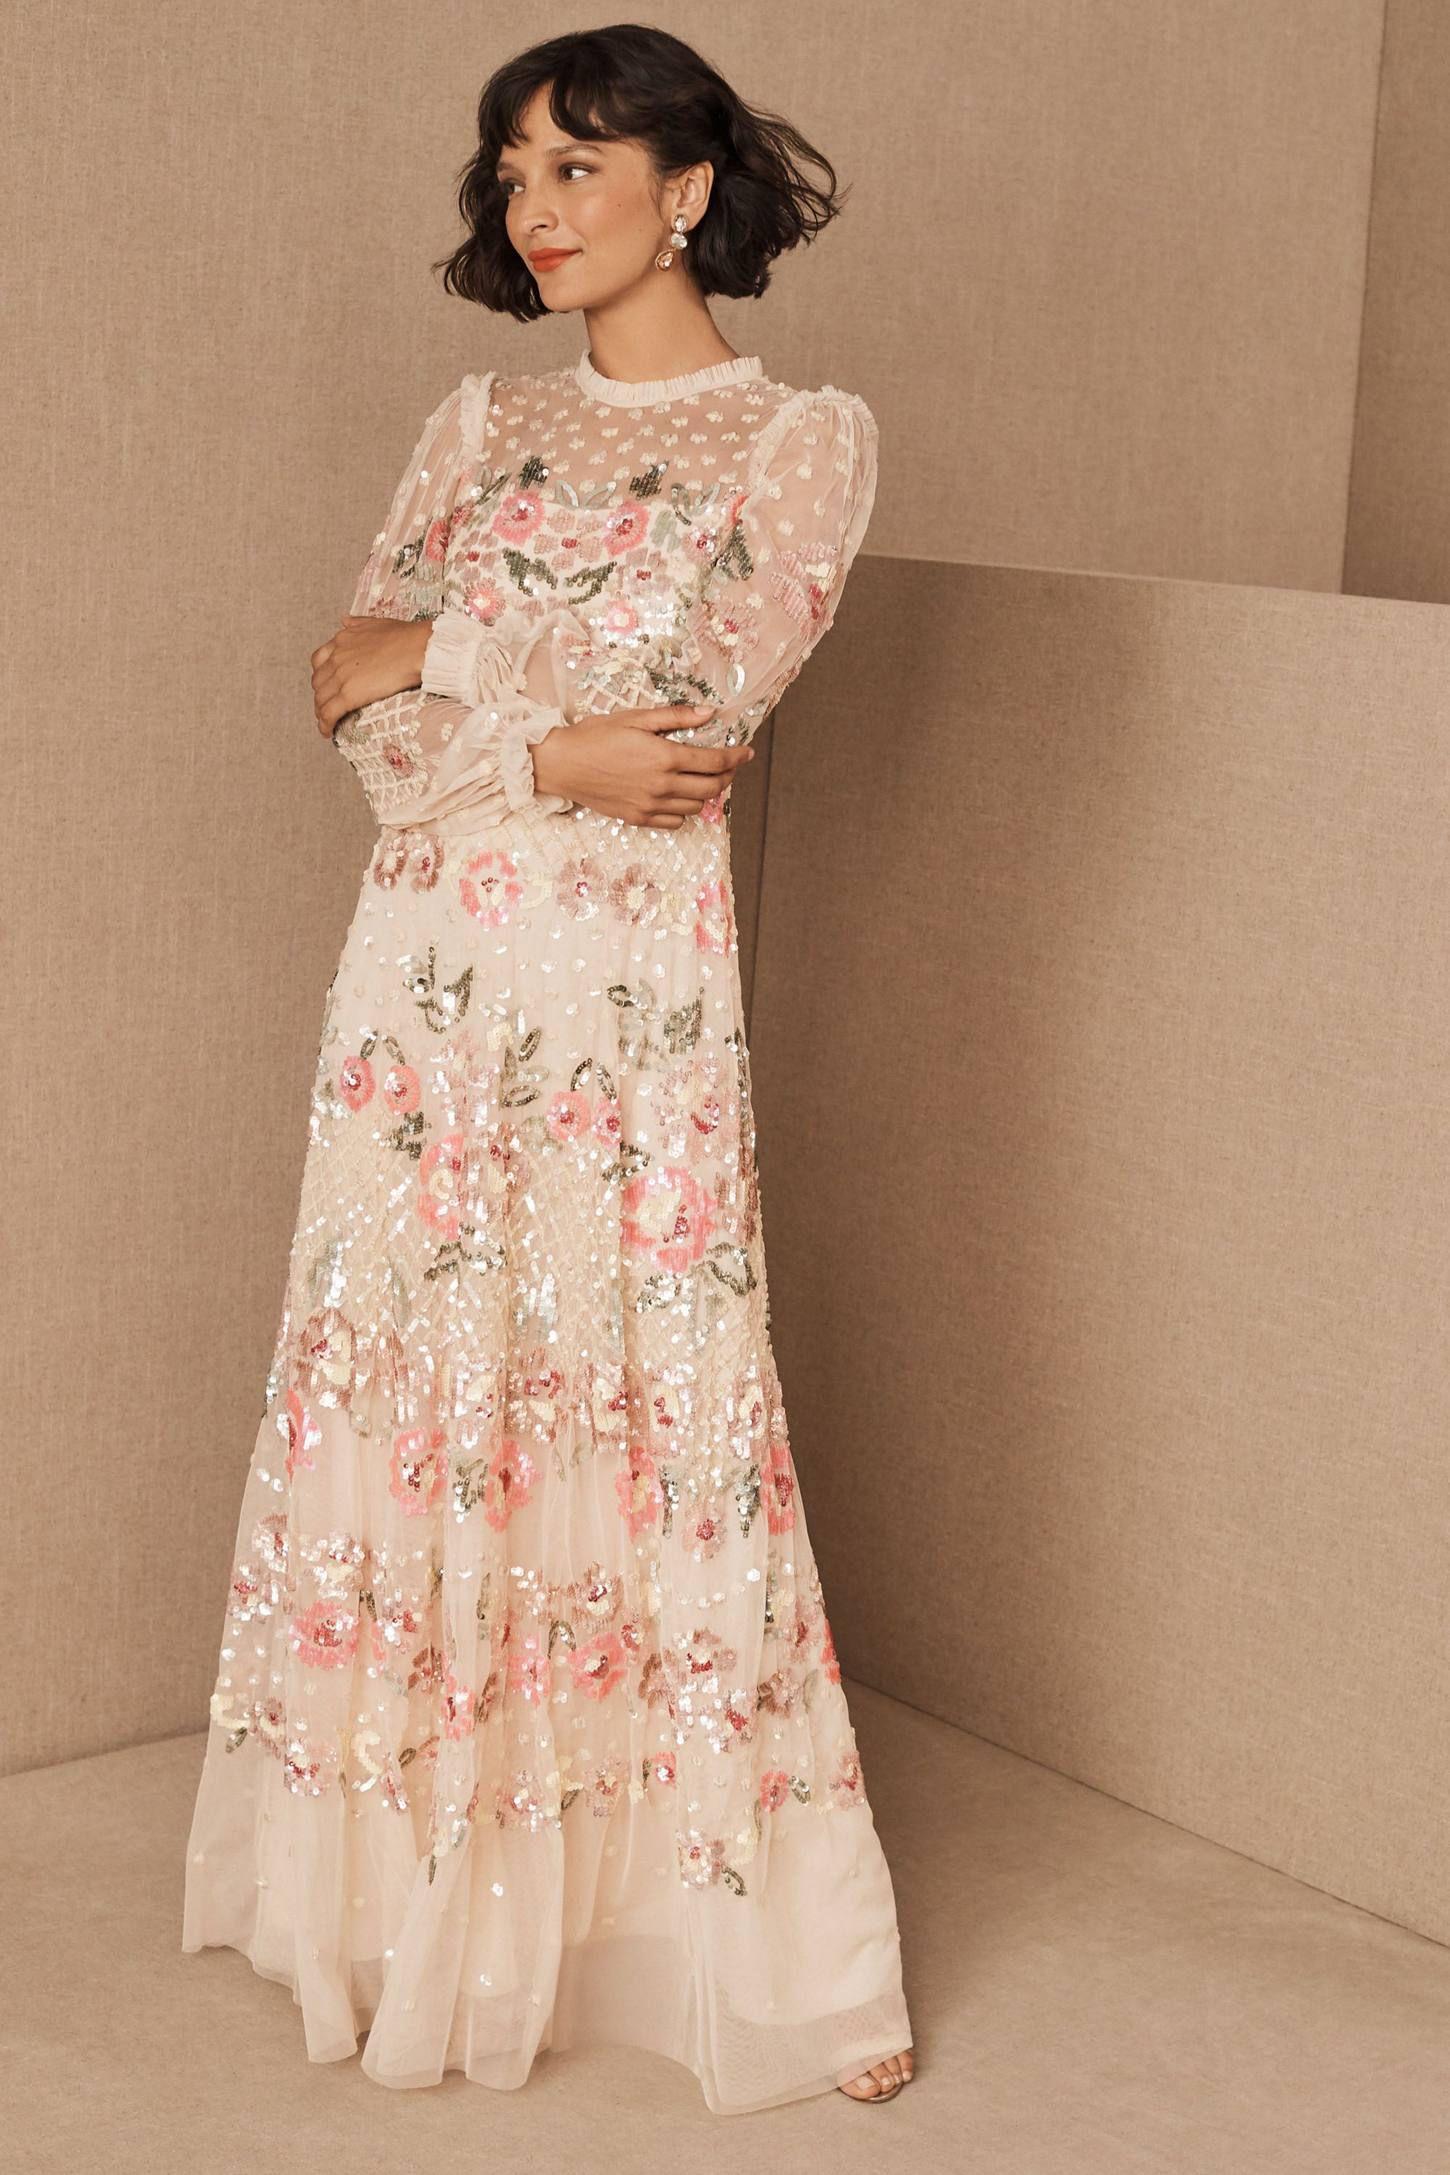 28+ Long Sleeve Winter Wedding Guest Dresses New 2020 ...